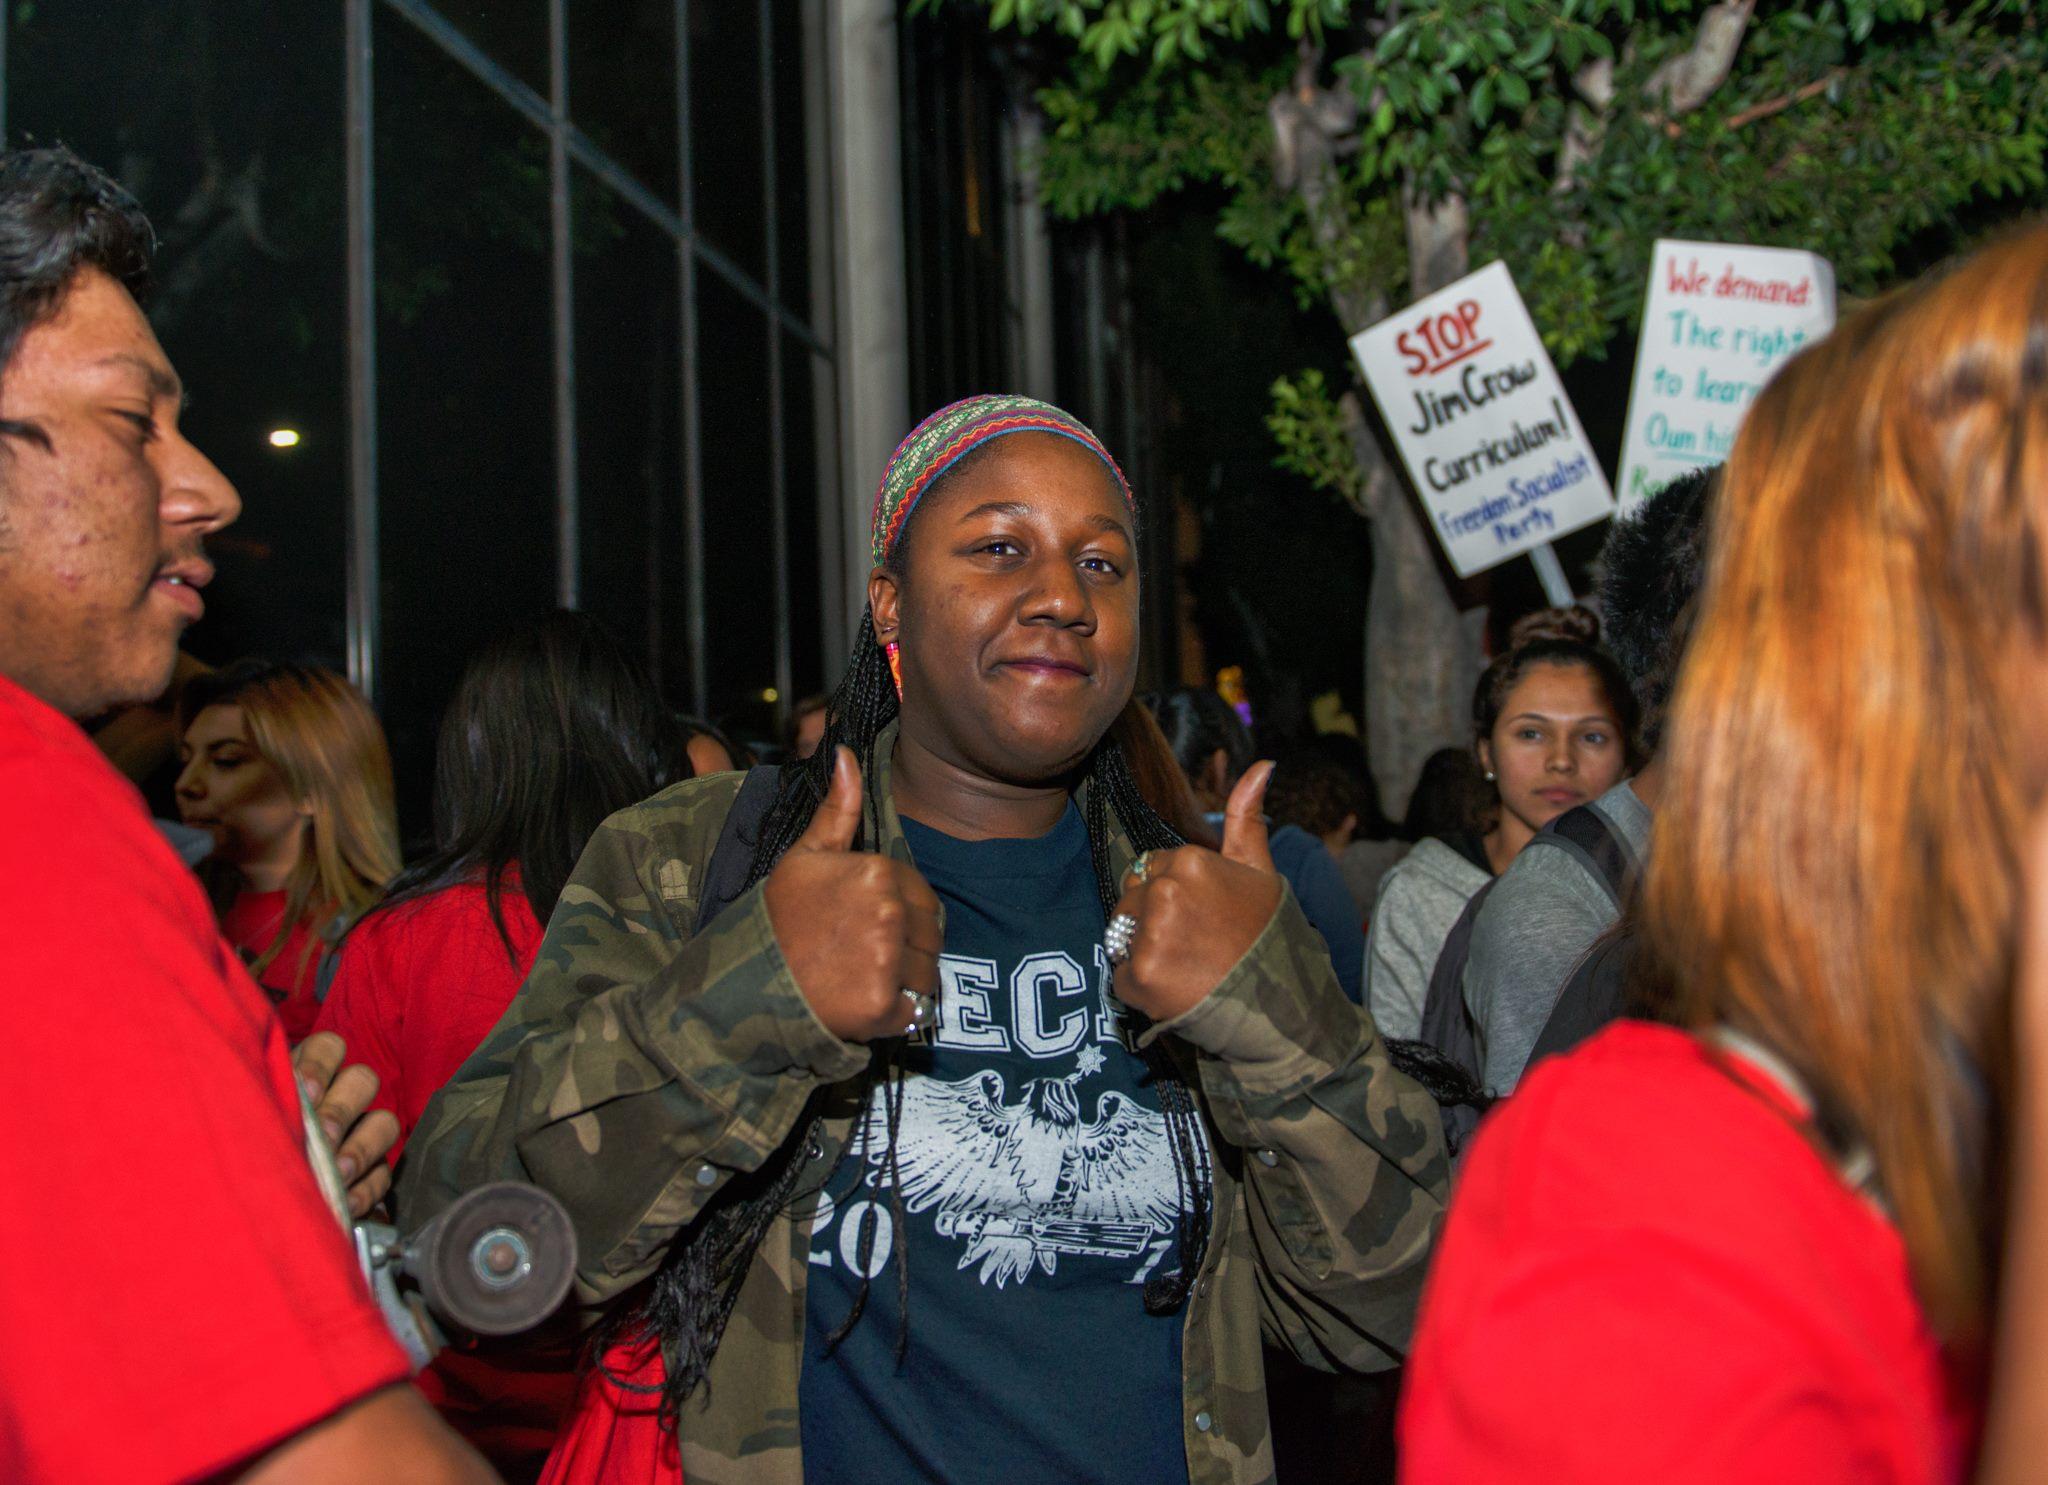 credit_Revo_Grafia_-_Rally_outside_with_Maya_Angelou_student_Michelle_Thomas_-_ESNC.jpg